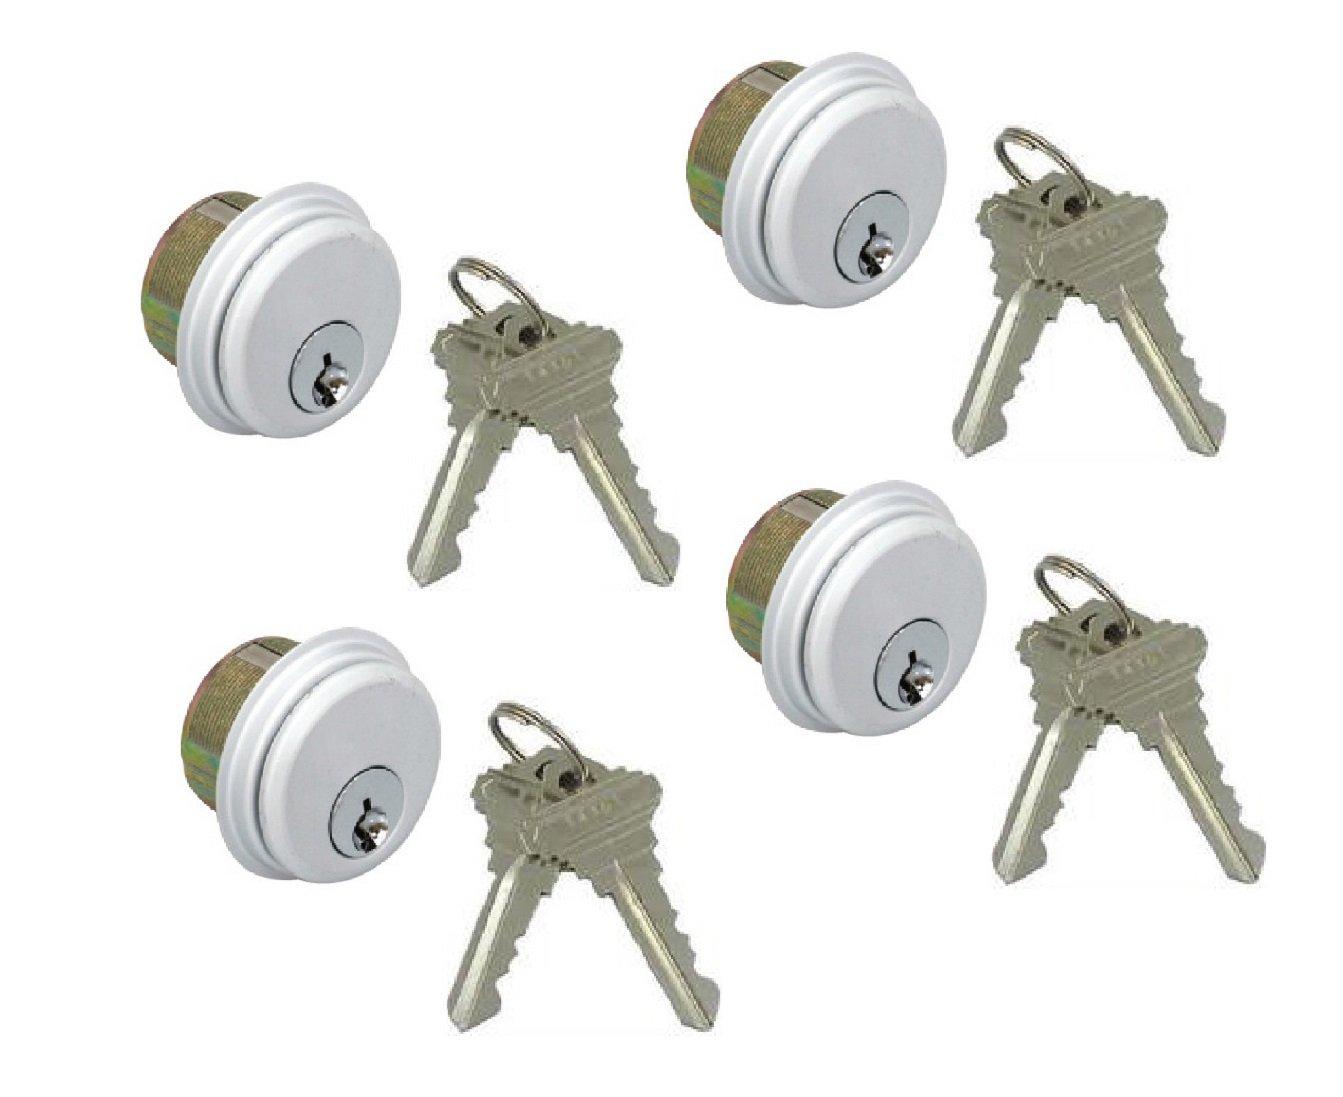 Pacific Doorware 4-Pack (Same keys) Mortise Lock Cylinders, Adams Rite Cam for Storefront Doors in Aluminum